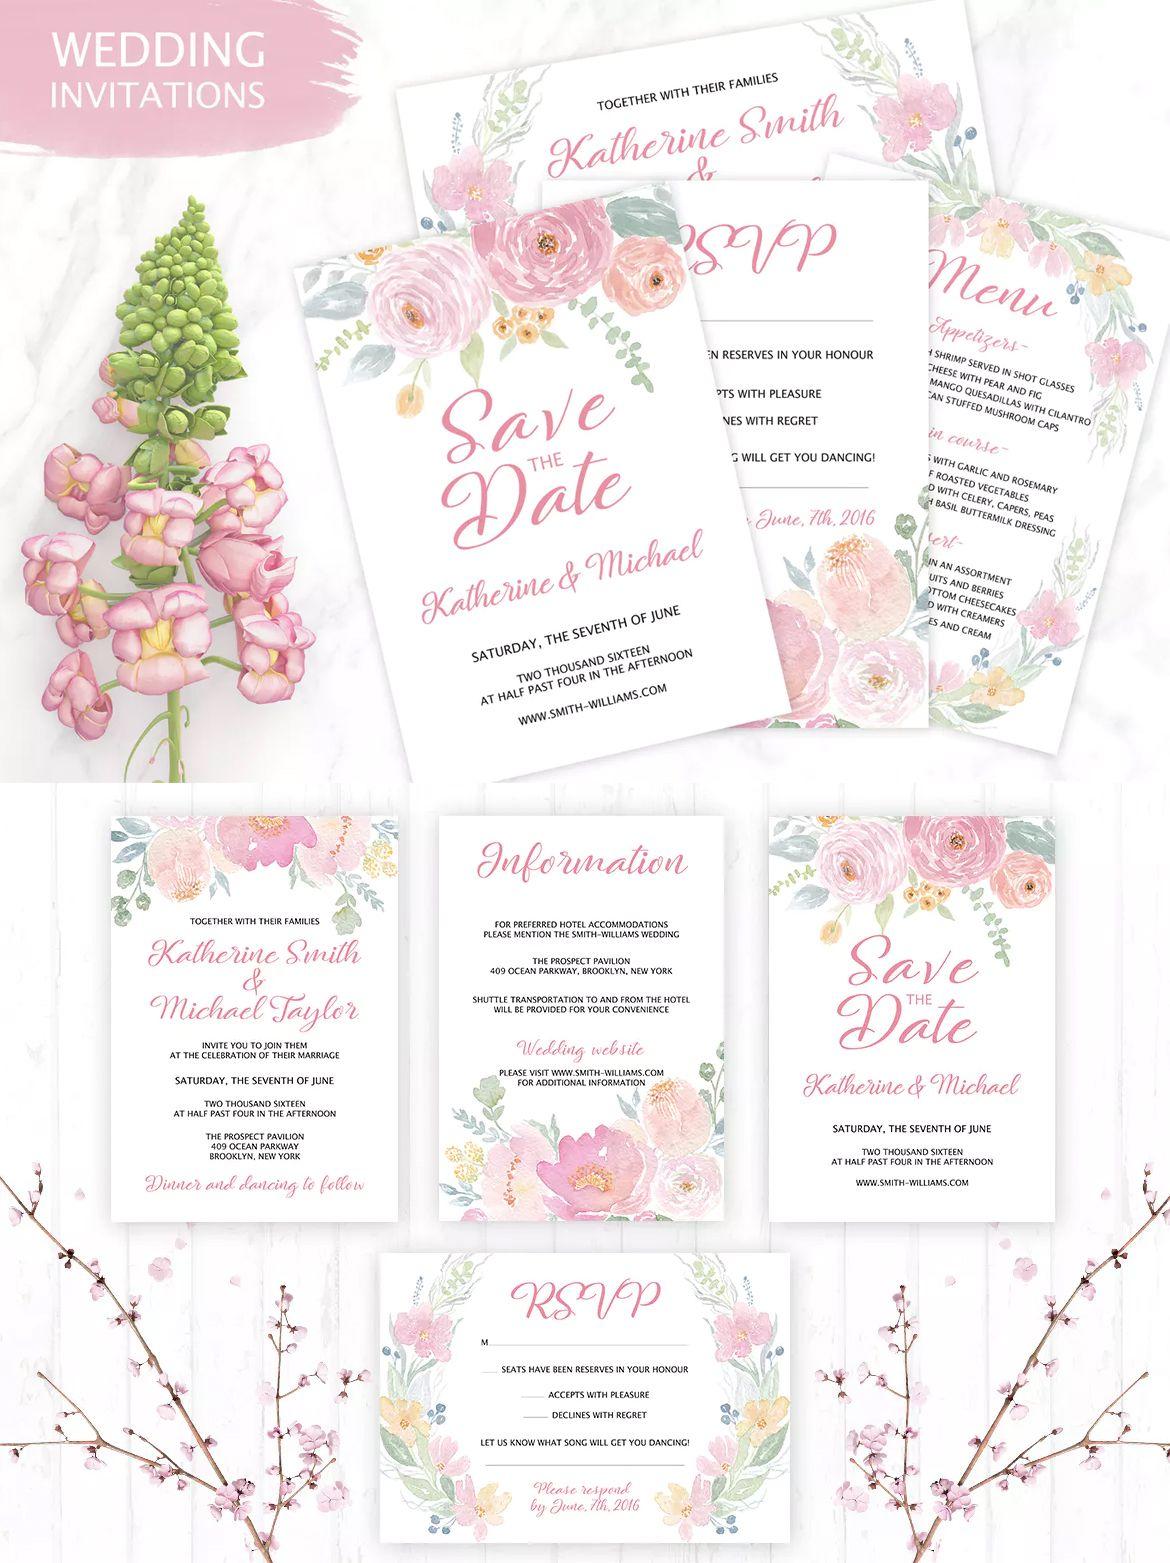 Tender wedding invitation templates psd wedding invitation card card templates tender wedding invitation templates psd stopboris Images